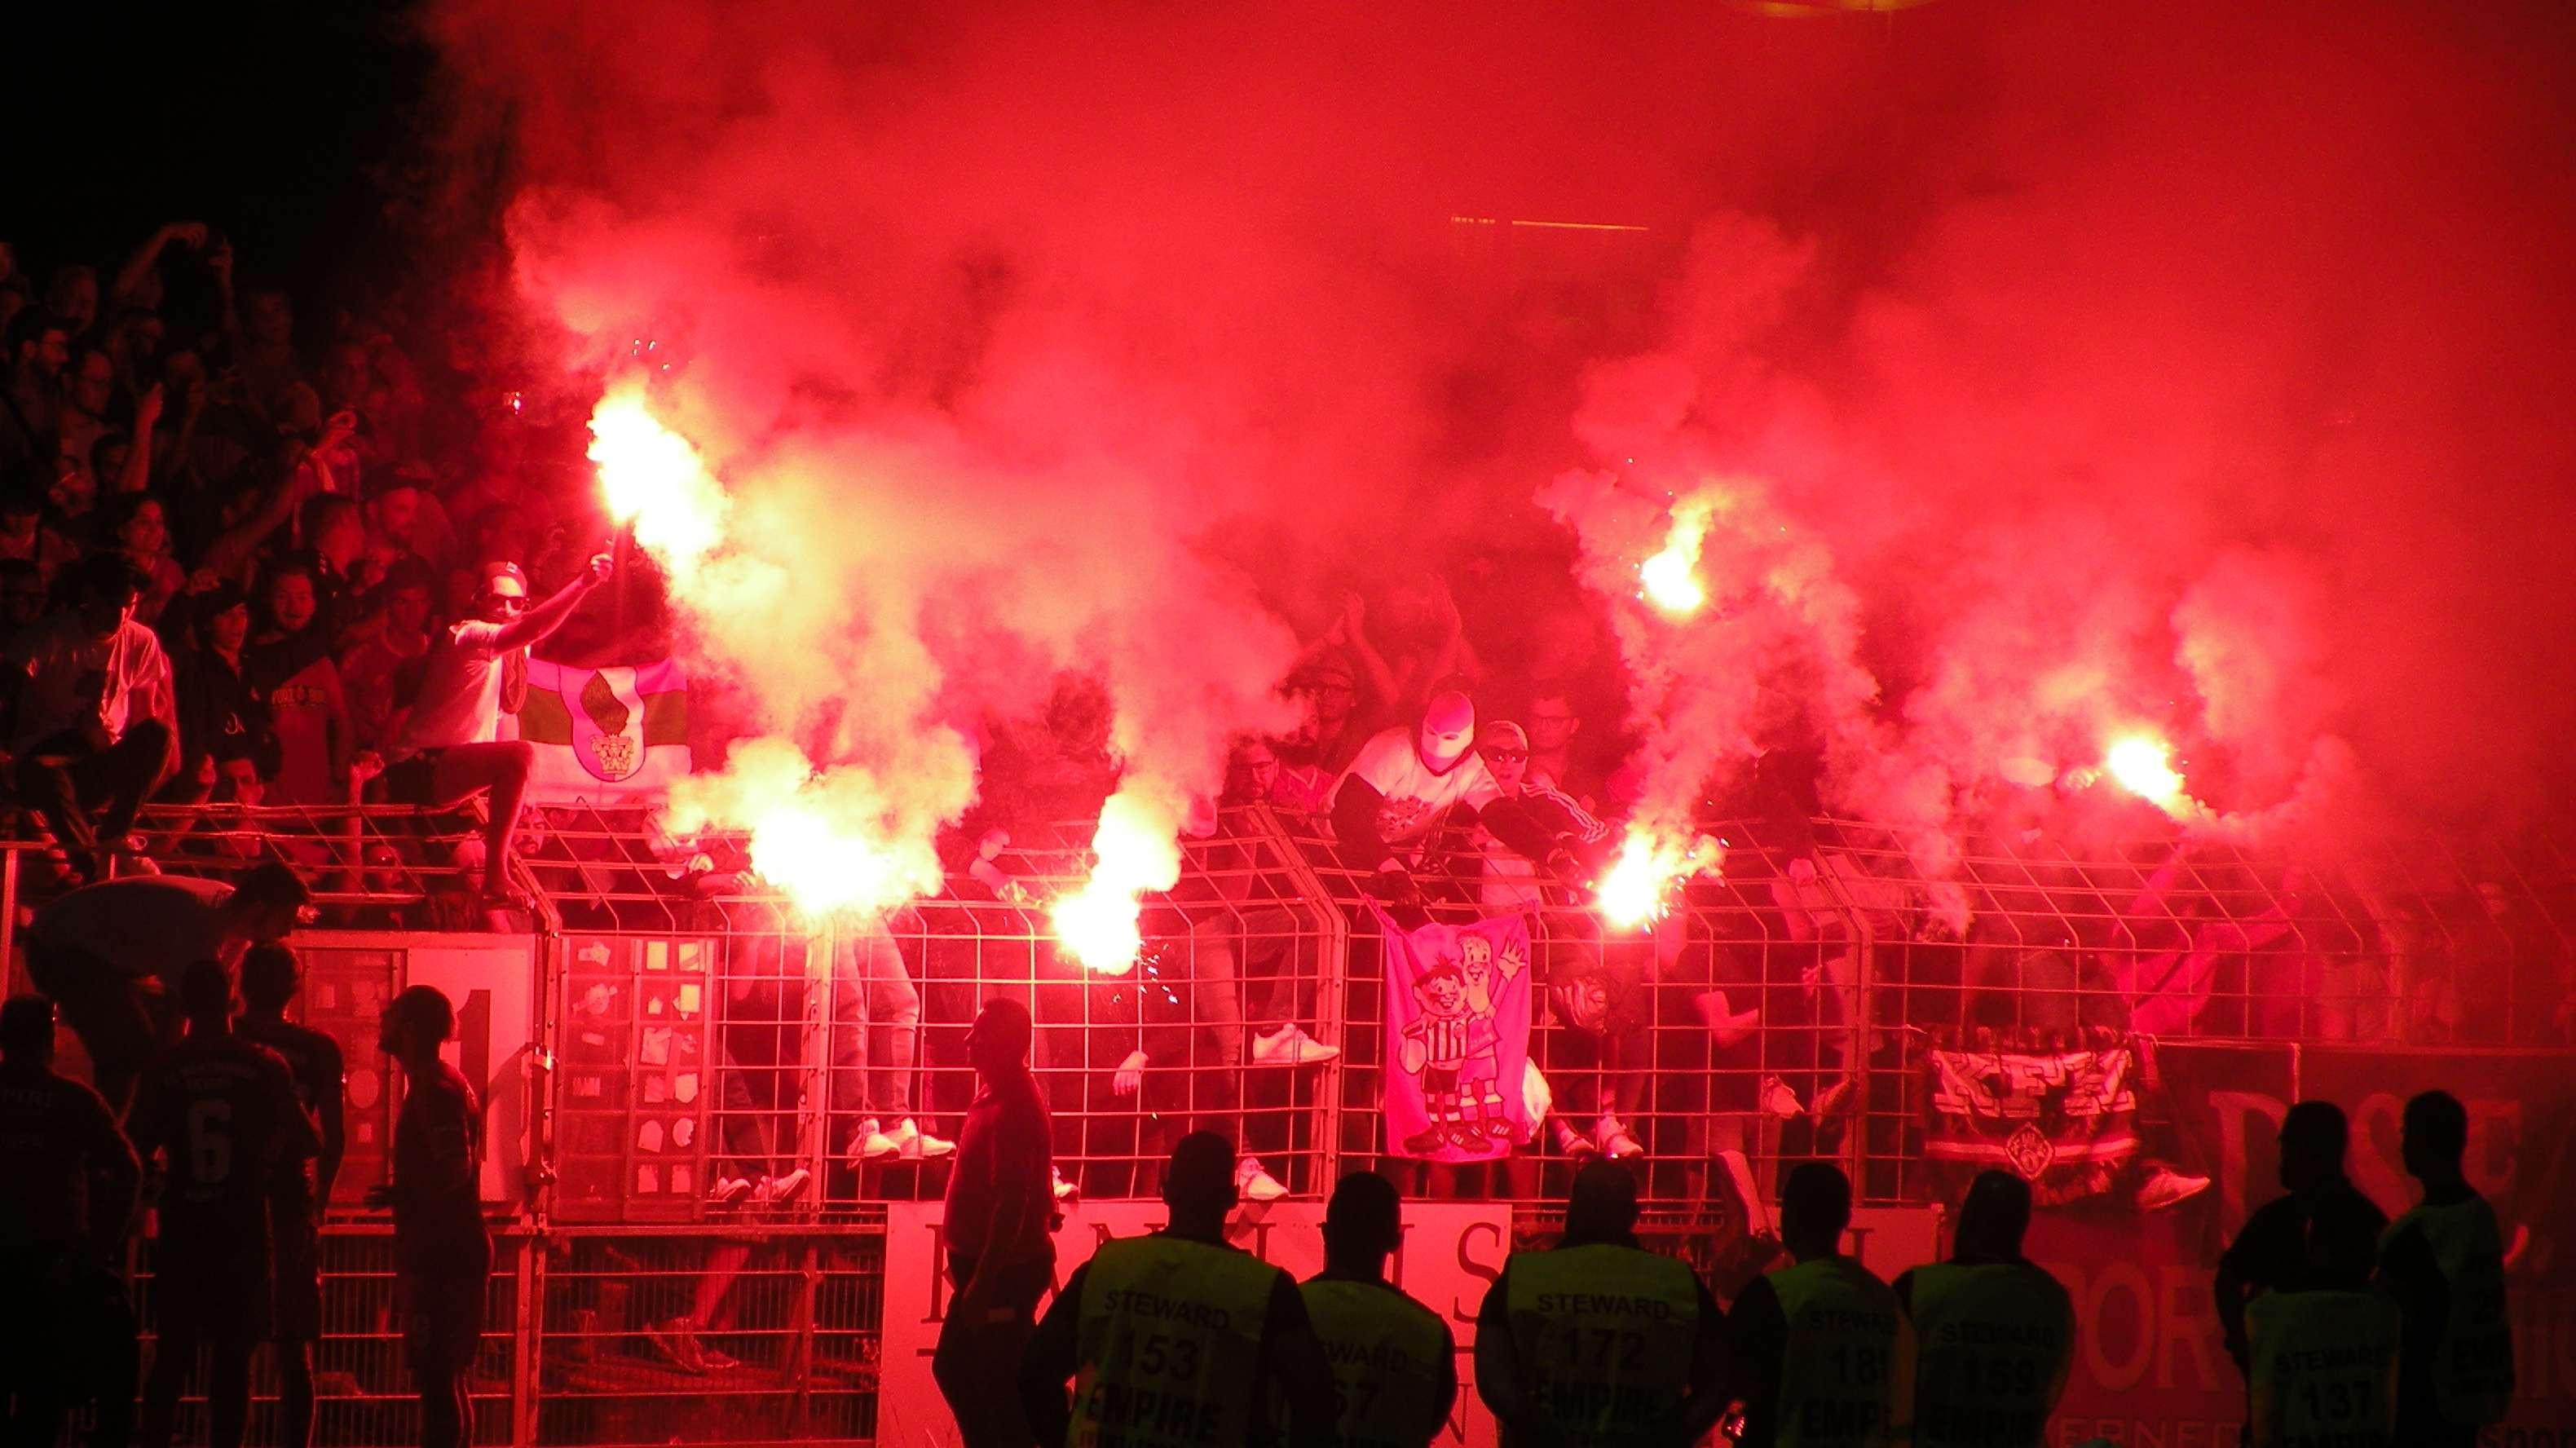 Fußballfans zünden Pyrotechnik